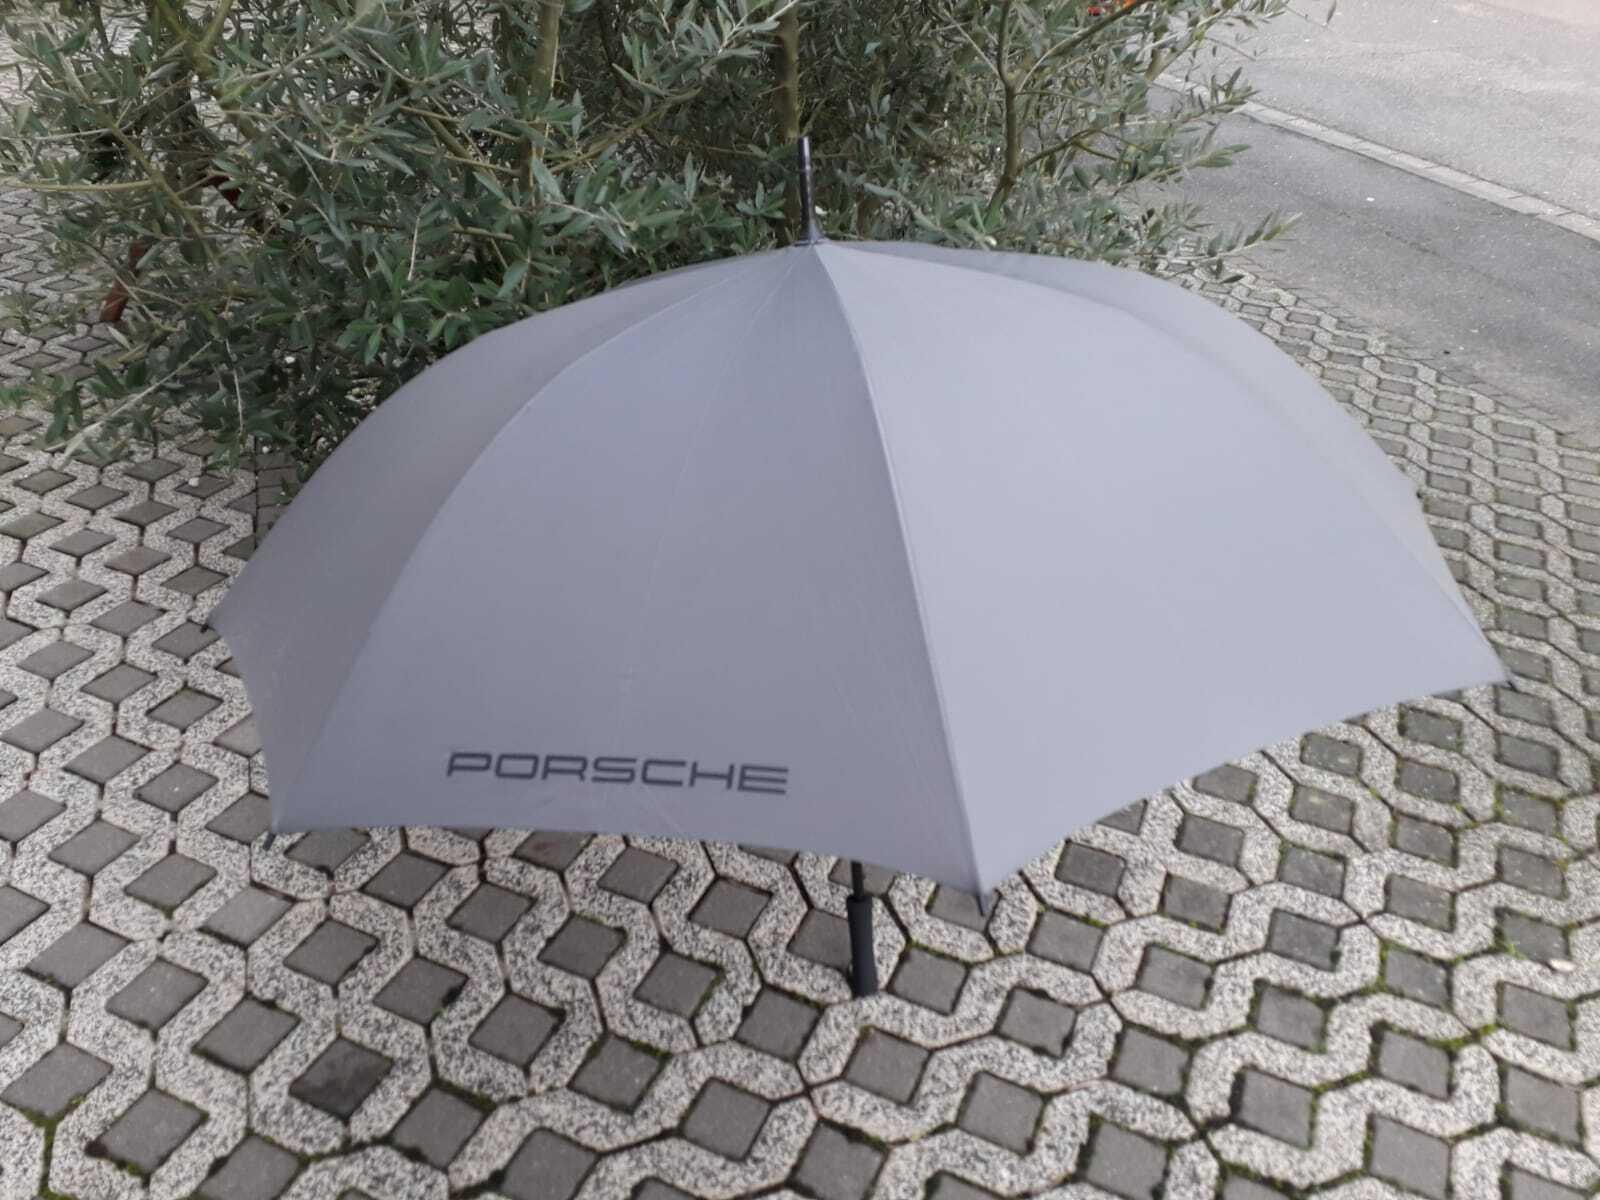 Porsche Designer XL Golf Regenschirm Sonnenschirm 2 Personen 122 cm NEU & OVP